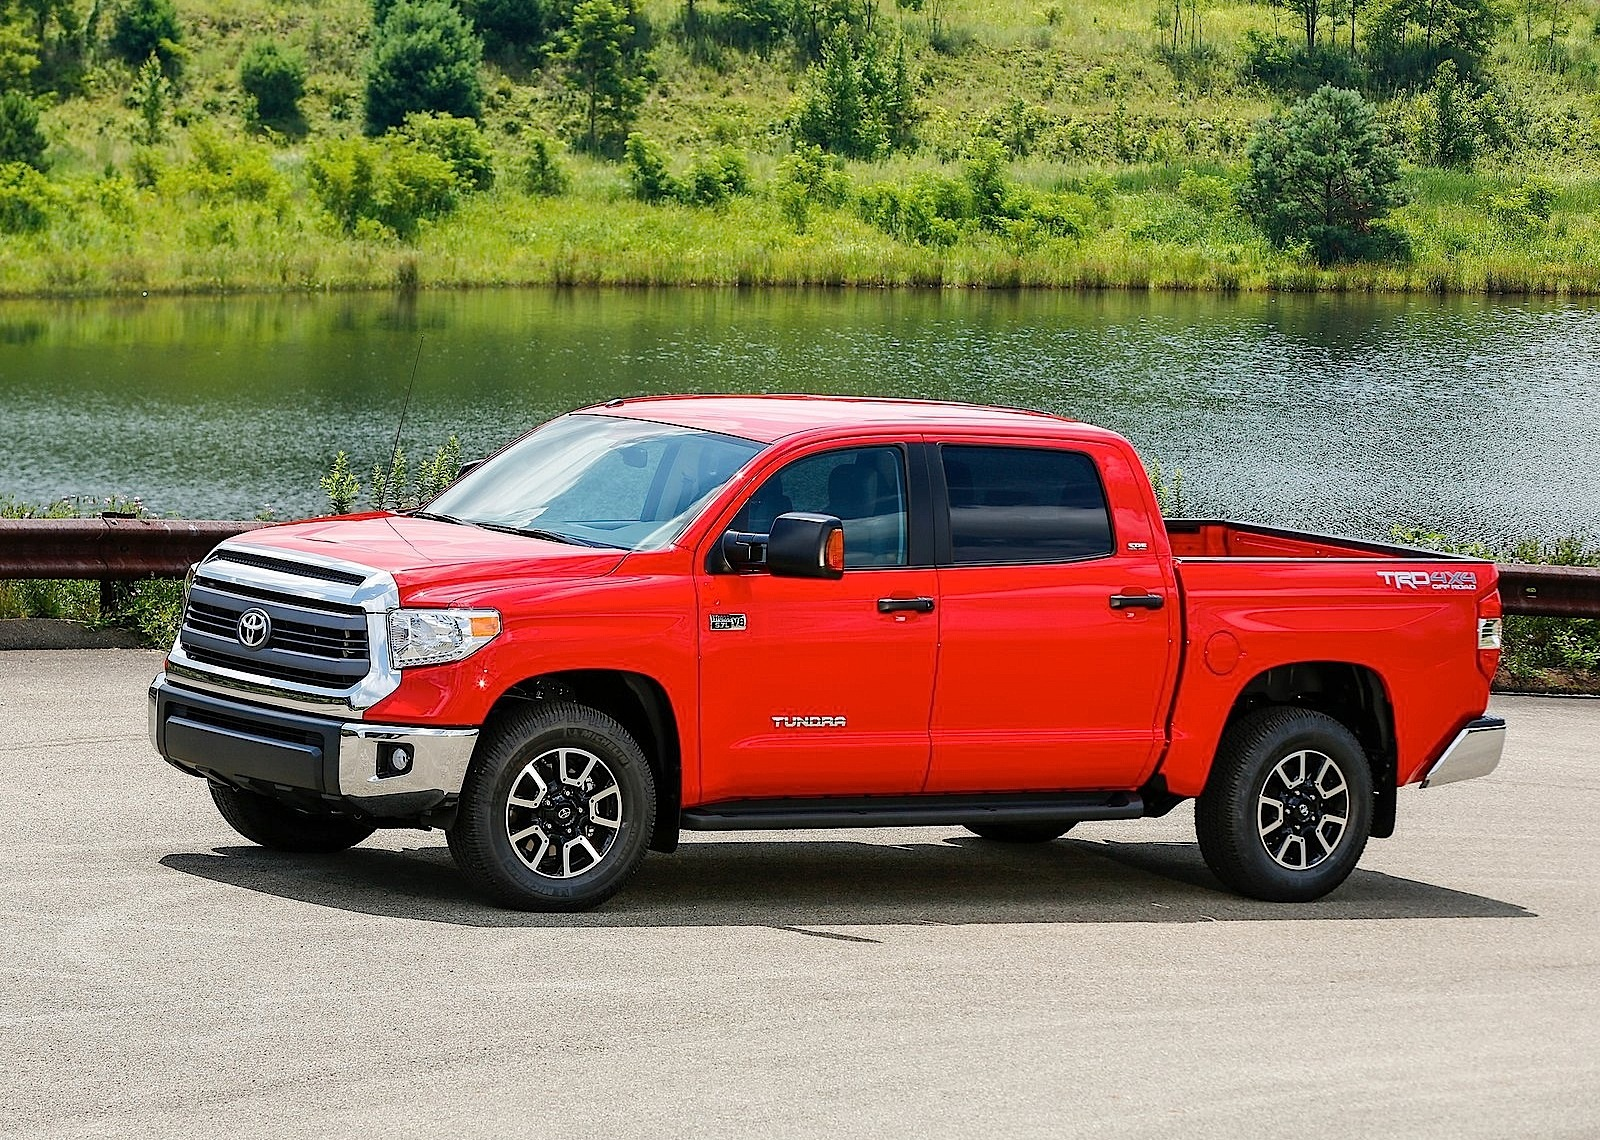 2017 Toyota Tundra Trd Pro >> TOYOTA Tundra Crew Cab specs & photos - 2013, 2014, 2015, 2016, 2017, 2018, 2019, 2020 ...